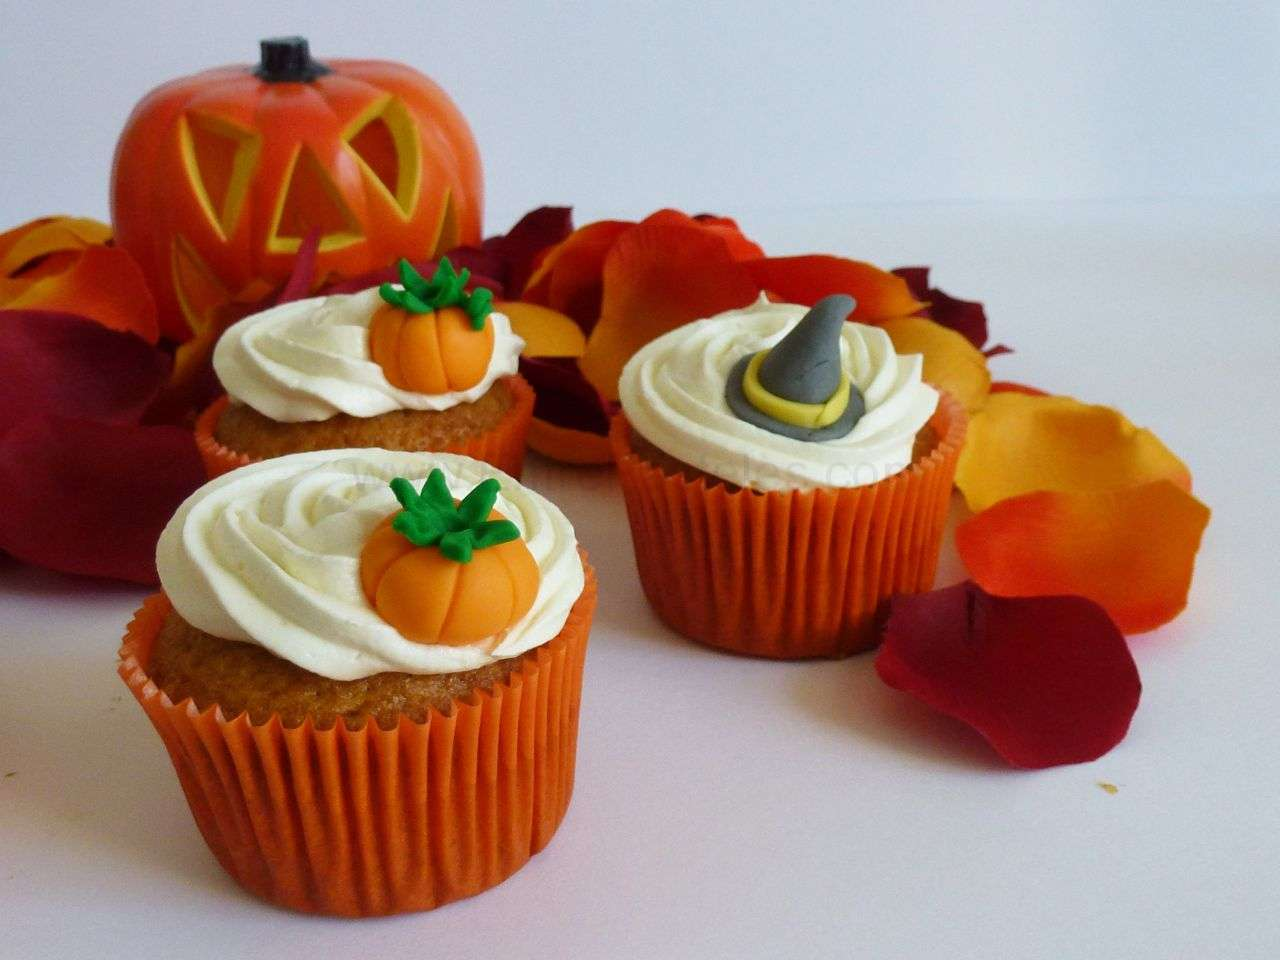 2013-10-18-12h30m15s-cupcakescalabaza